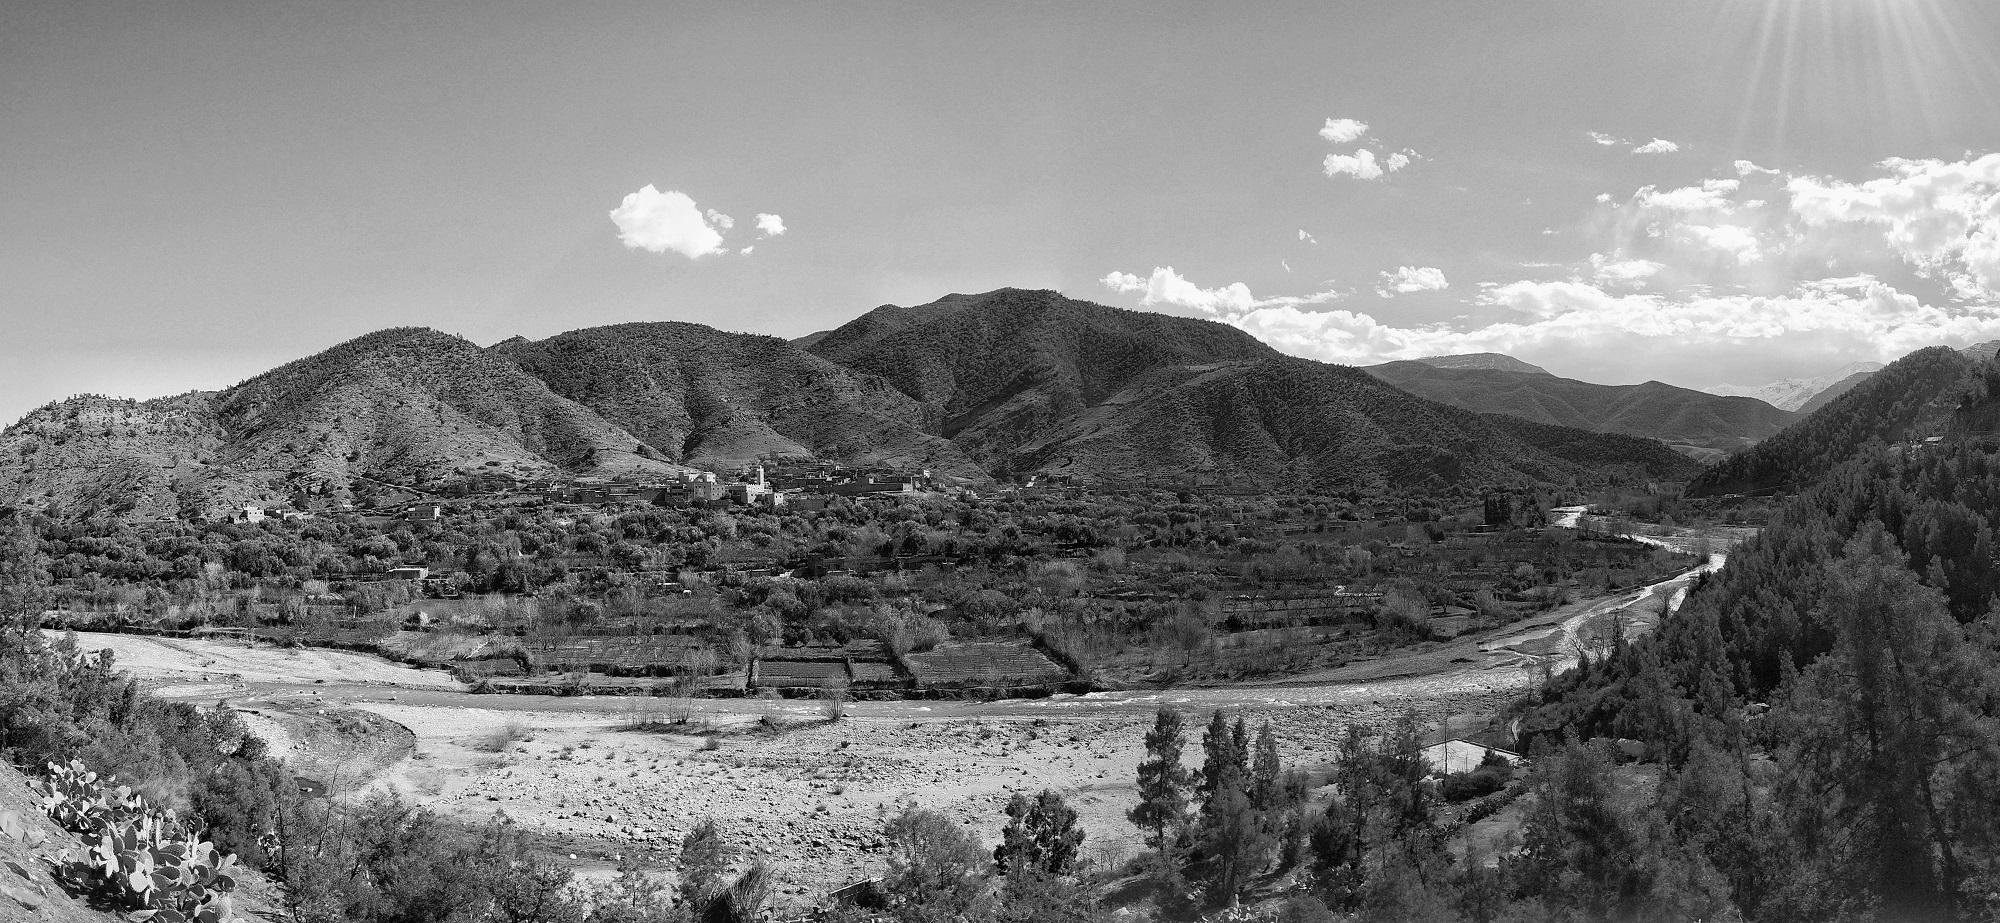 Ourika Valley. Taken with Google Pixel.